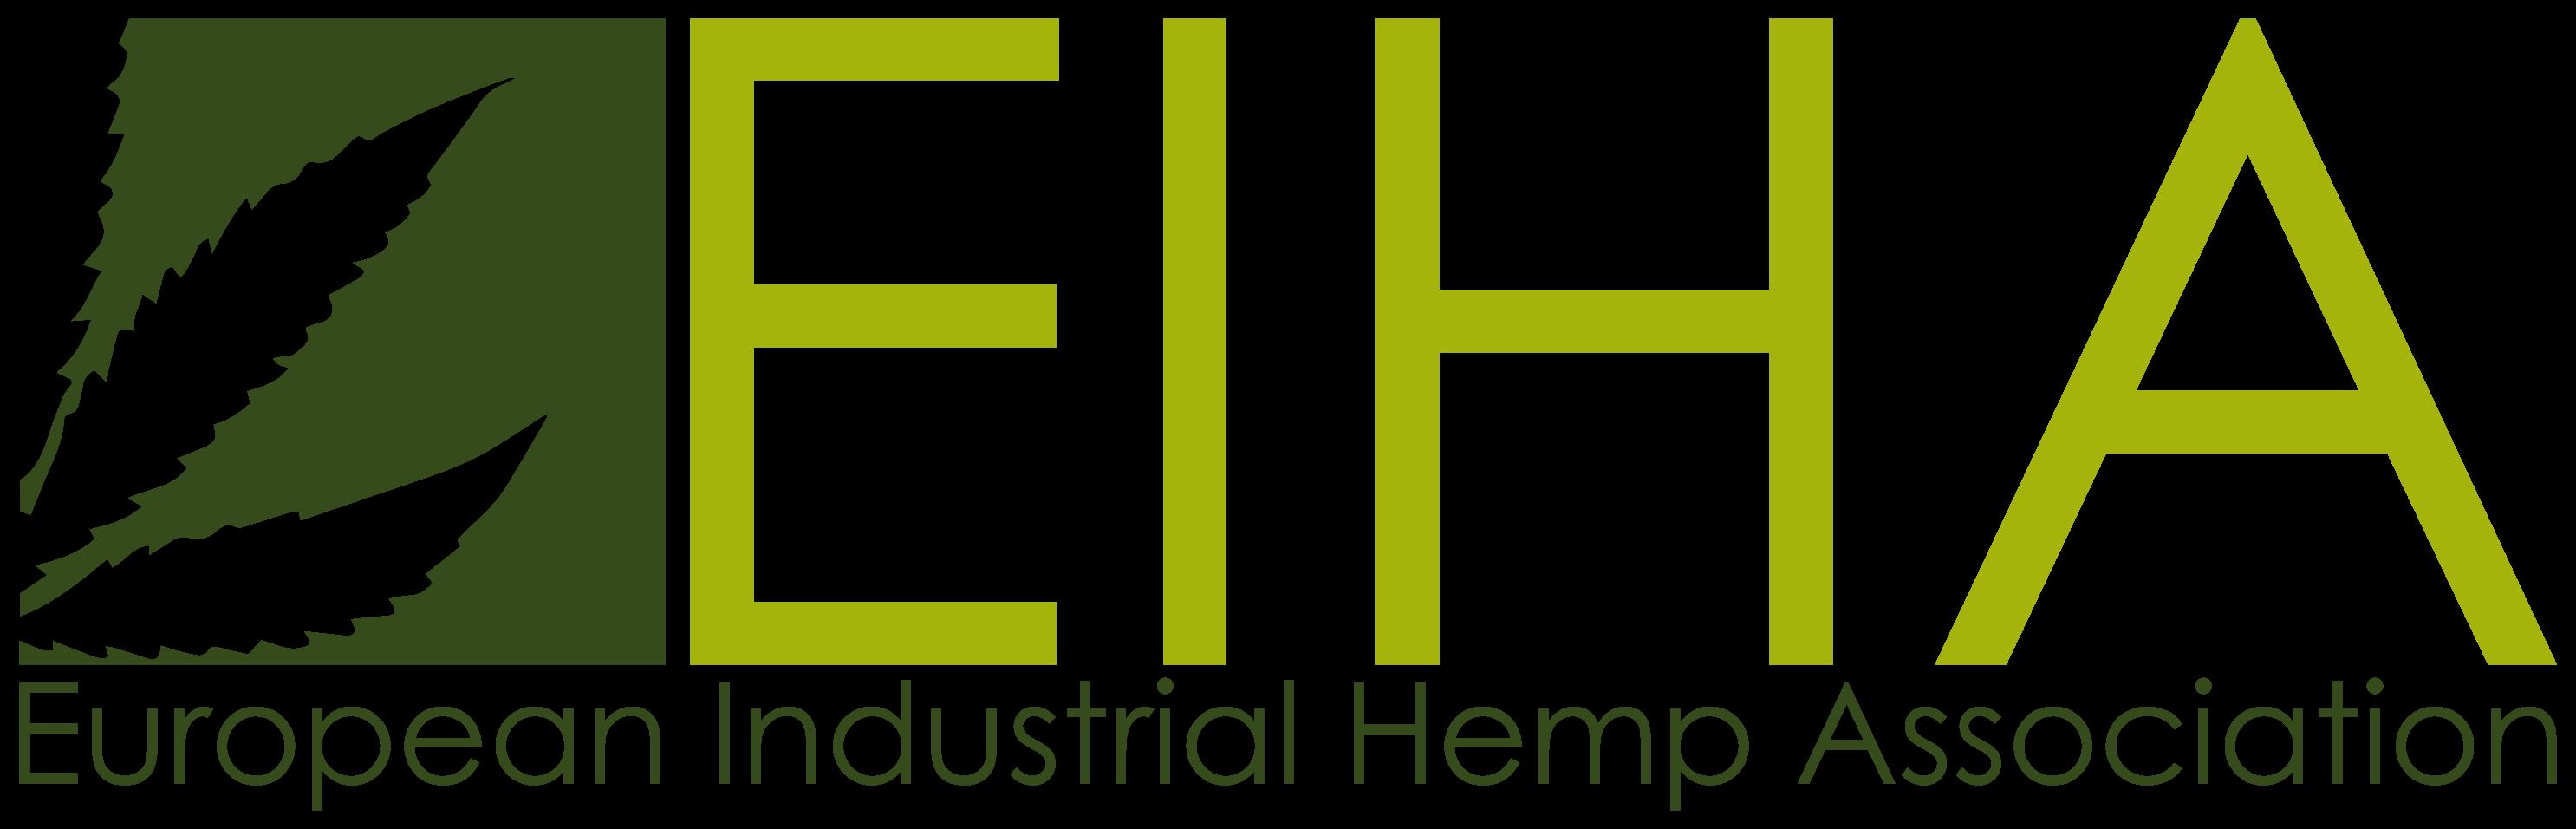 eiha logo hempassociation lfc